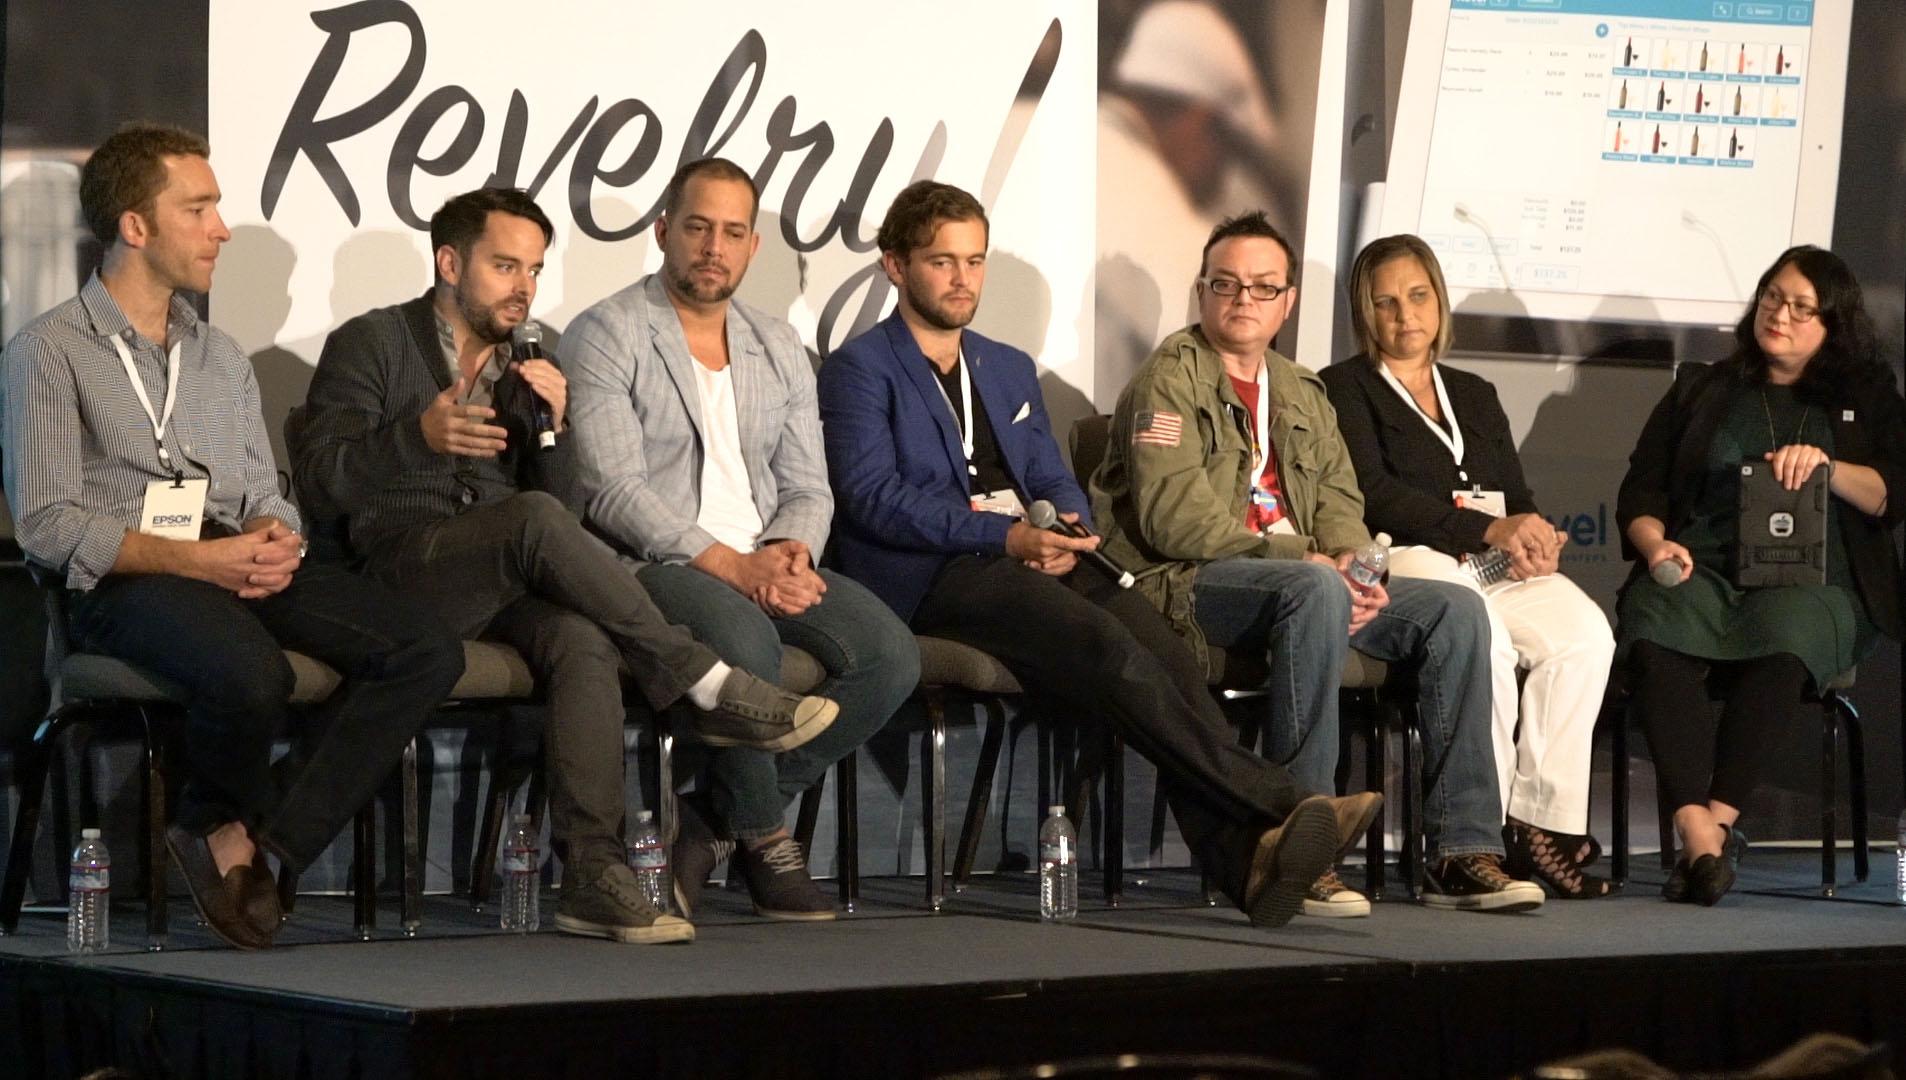 Merchants at Revelry Discuss Keys to Success